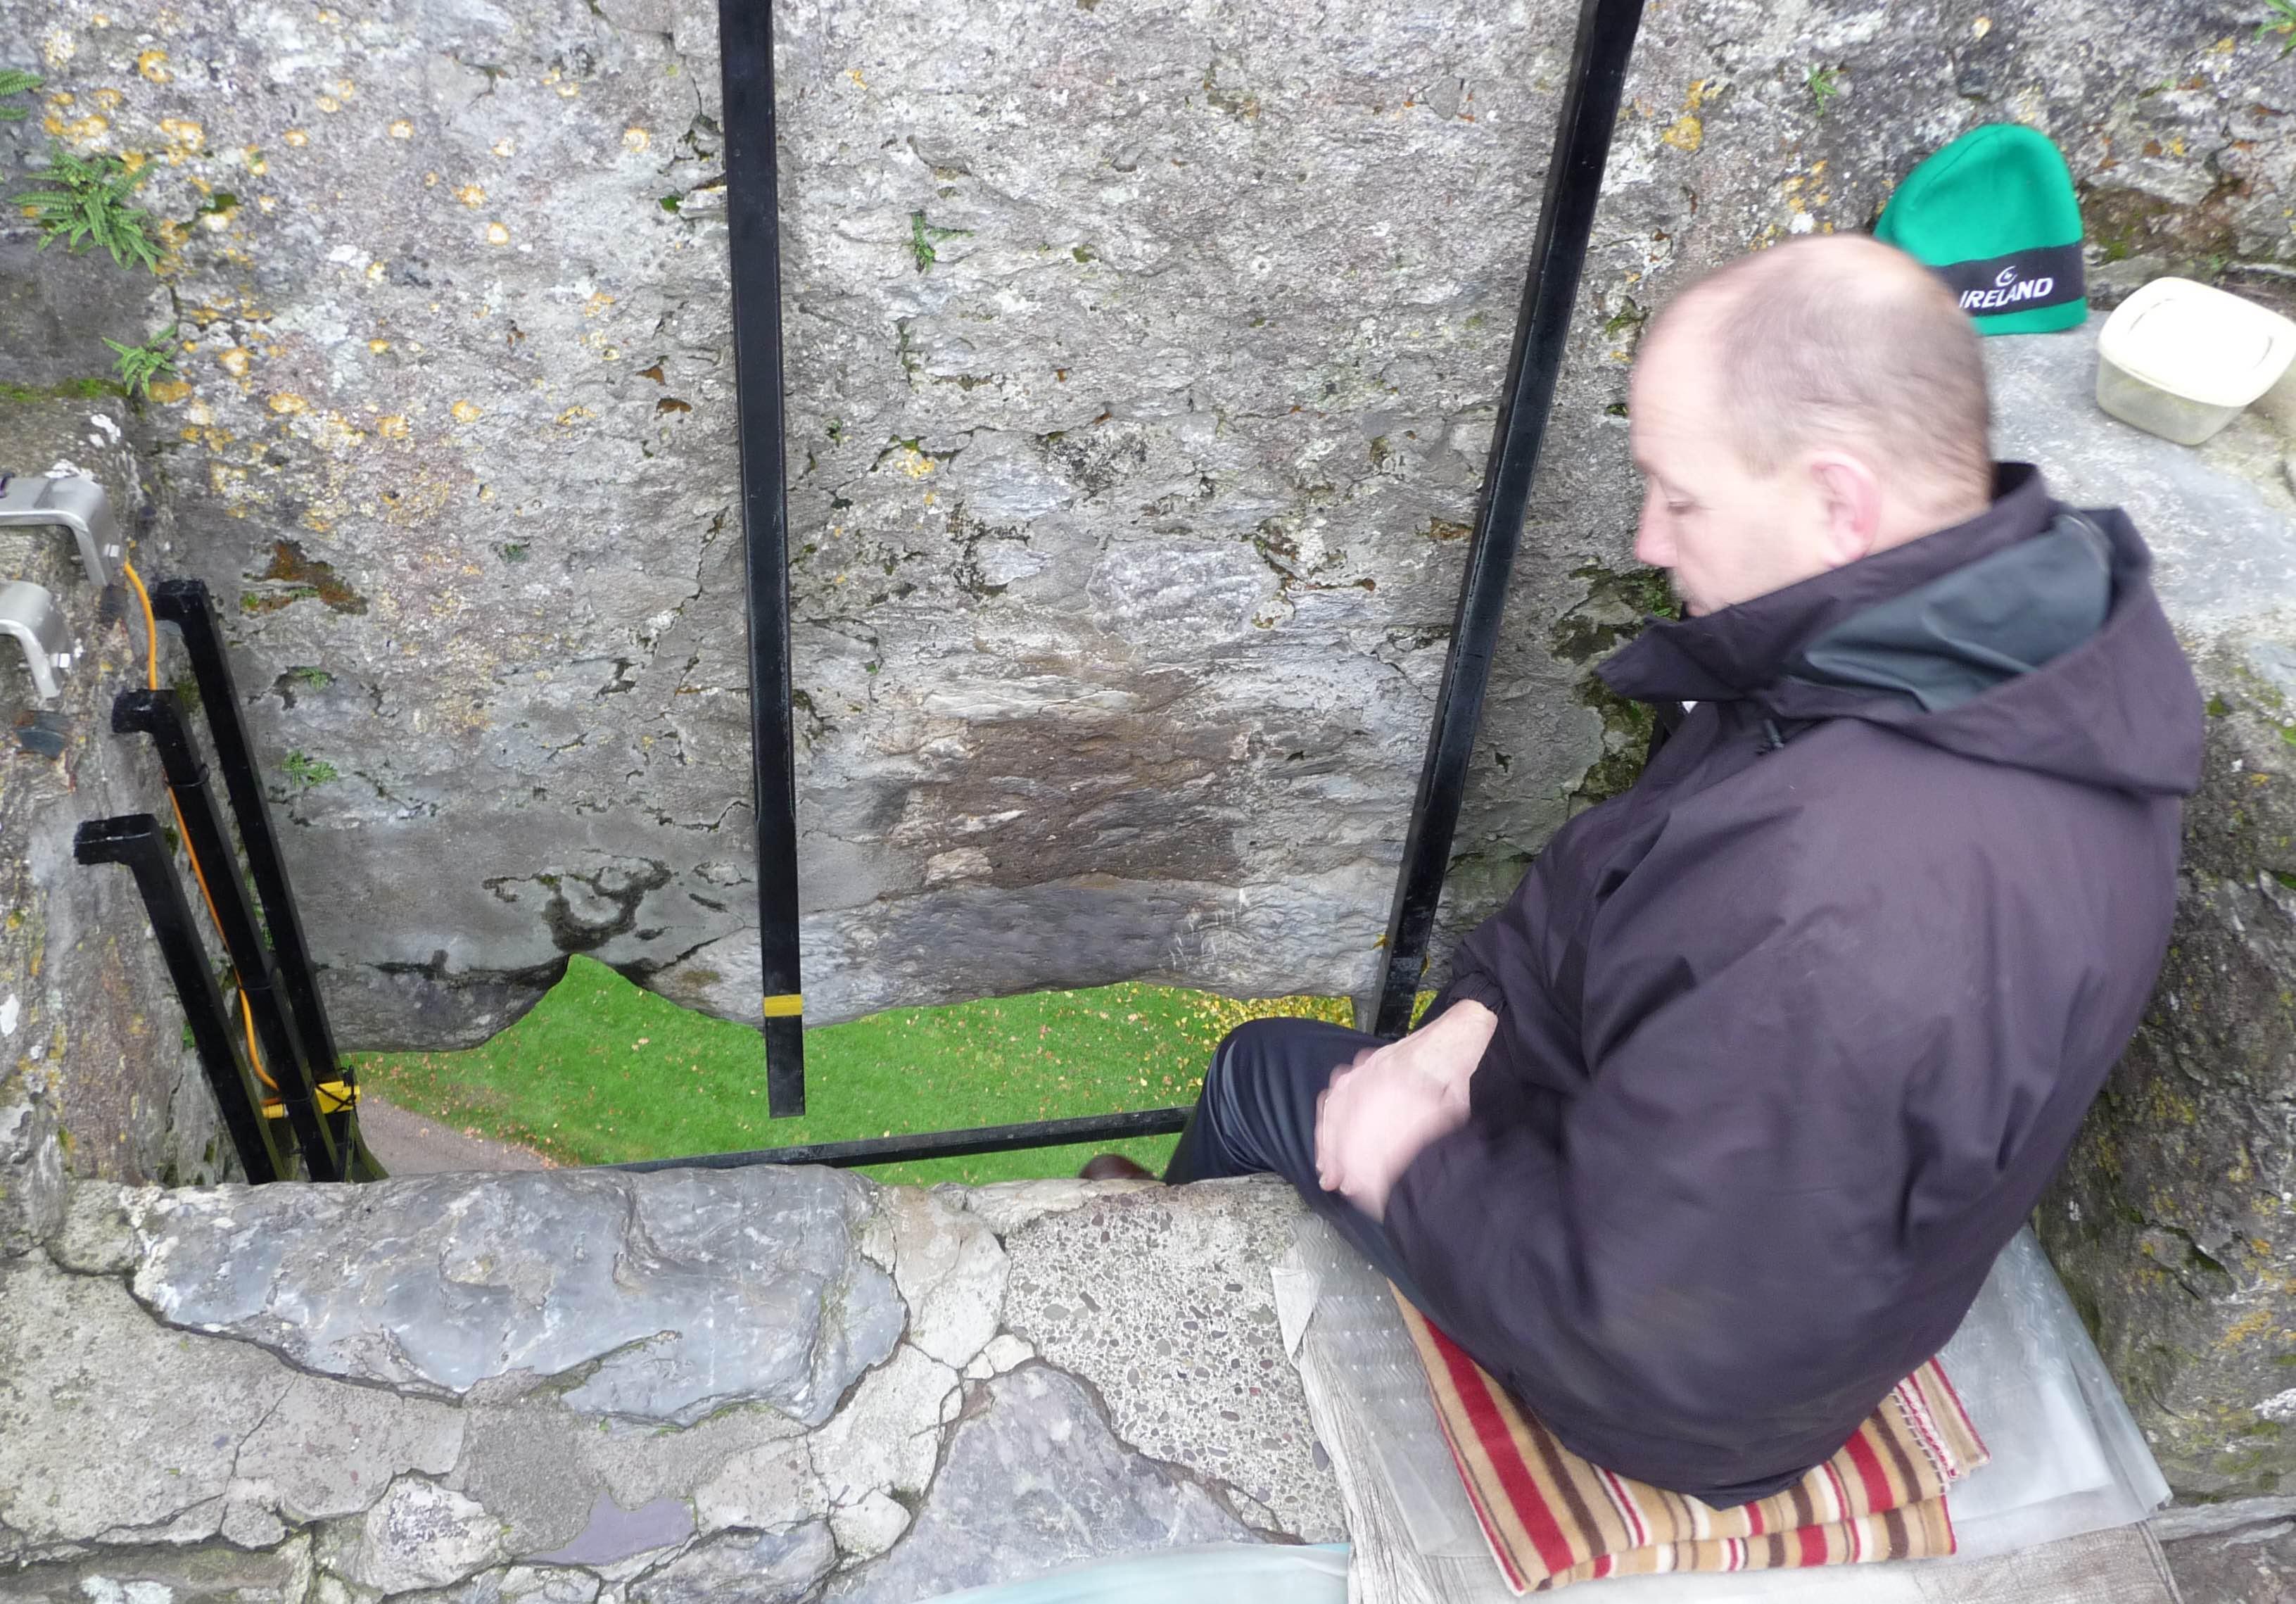 18.Blarney Stone